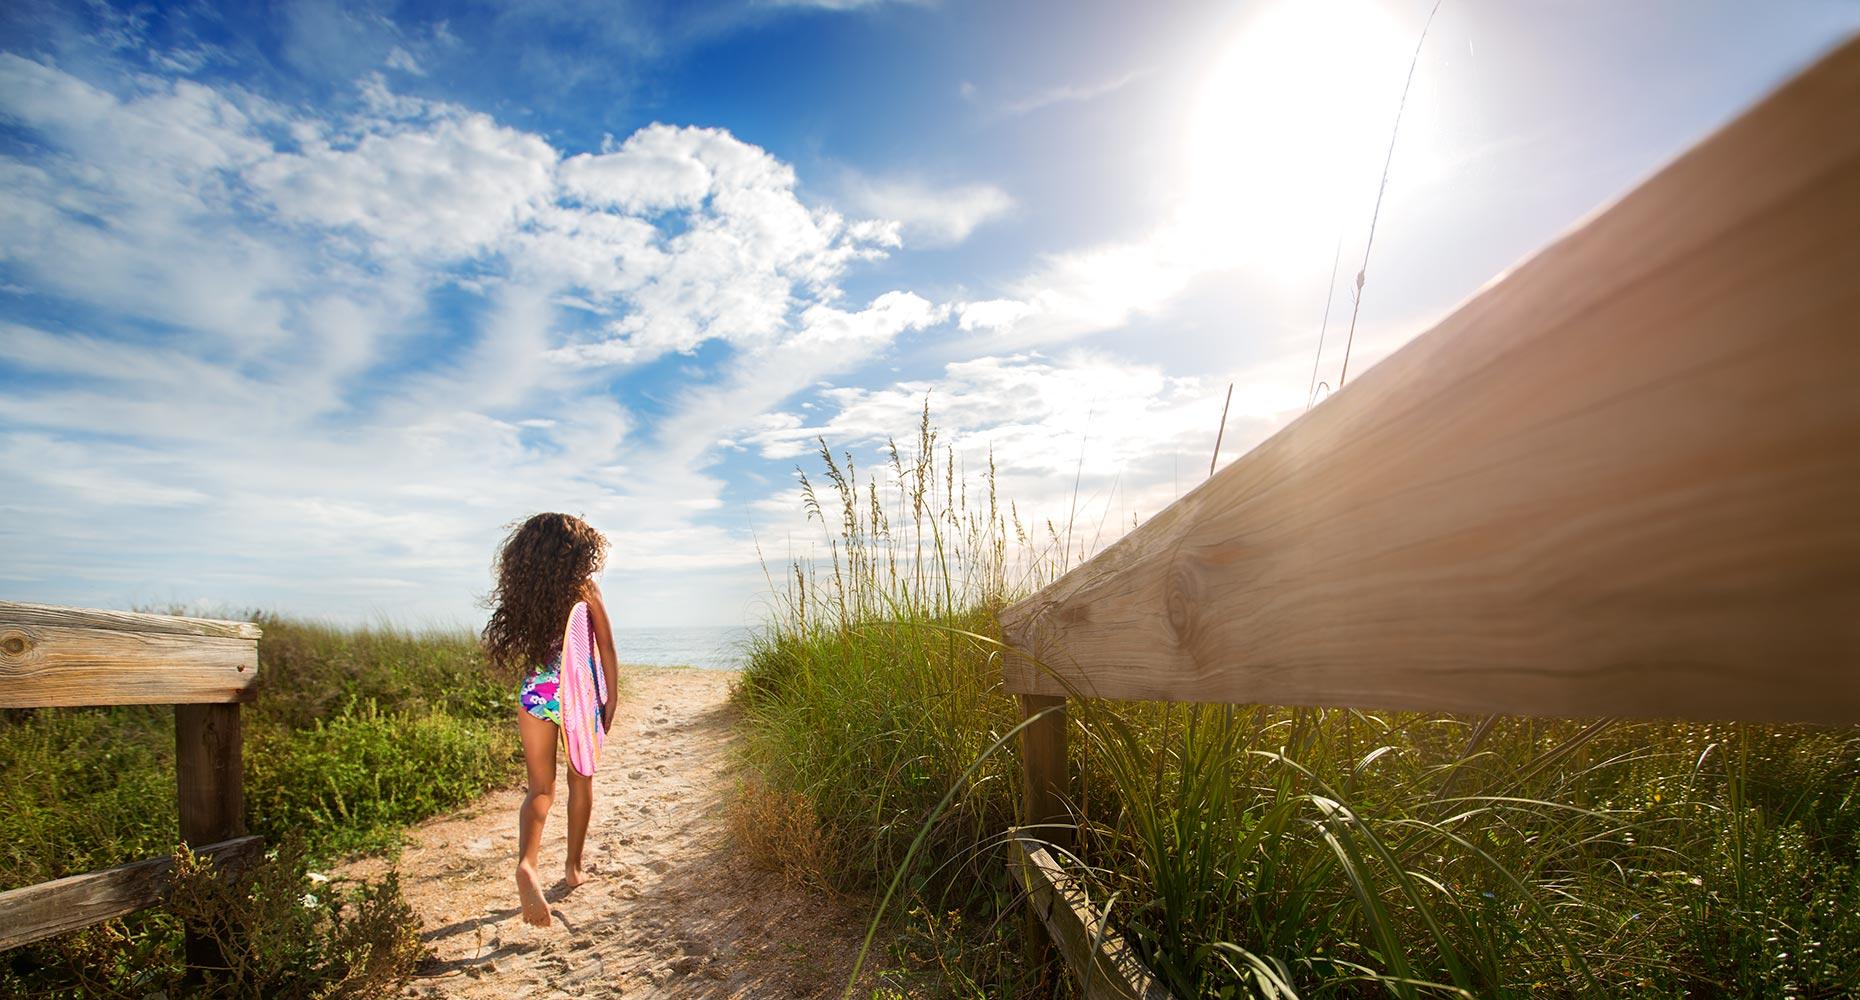 ST. AUGUSTINE - PONTE VEDRA FLORIDA  LOCATION: PONTE VEDRA, FLORIDA